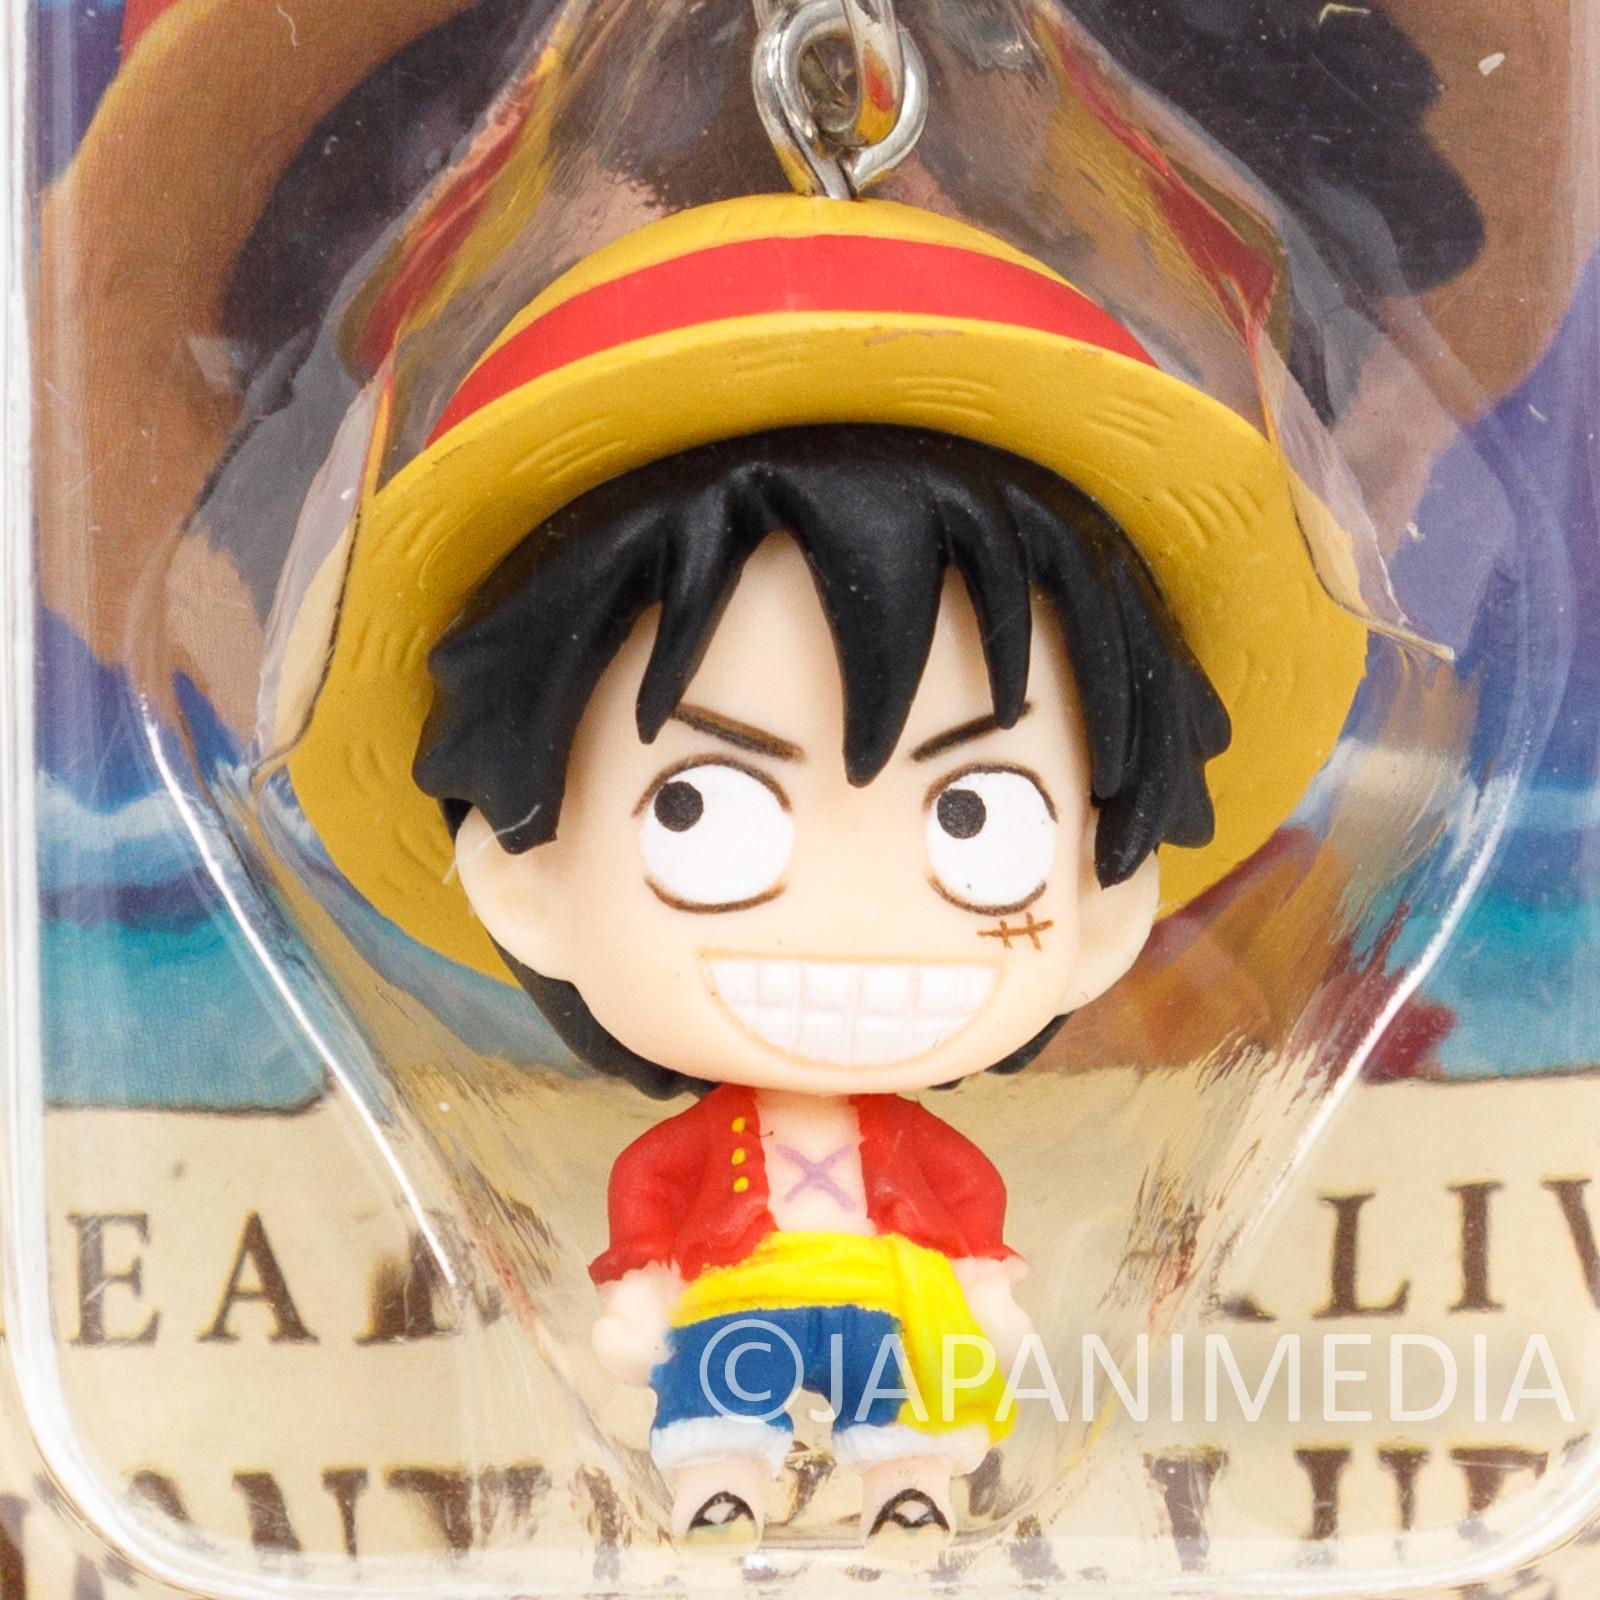 One Piece Monkey D. Luffy Mini Figure Chara Fortune Megahouse JAPAN ANIME